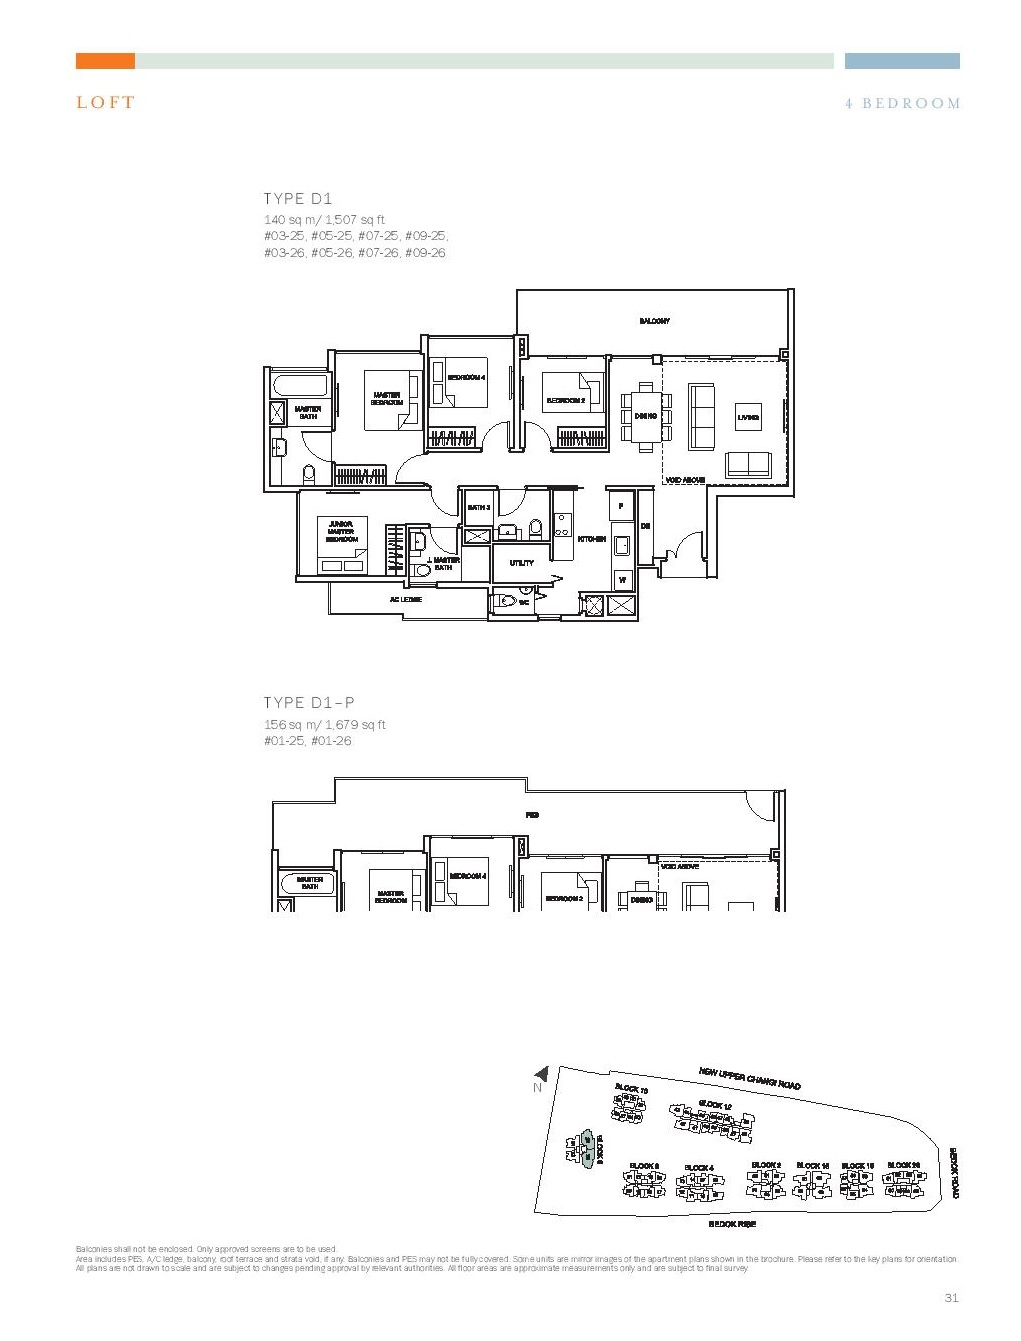 Loft 4 bed the glades at tanah merah for 4 bedroom loft floor plans